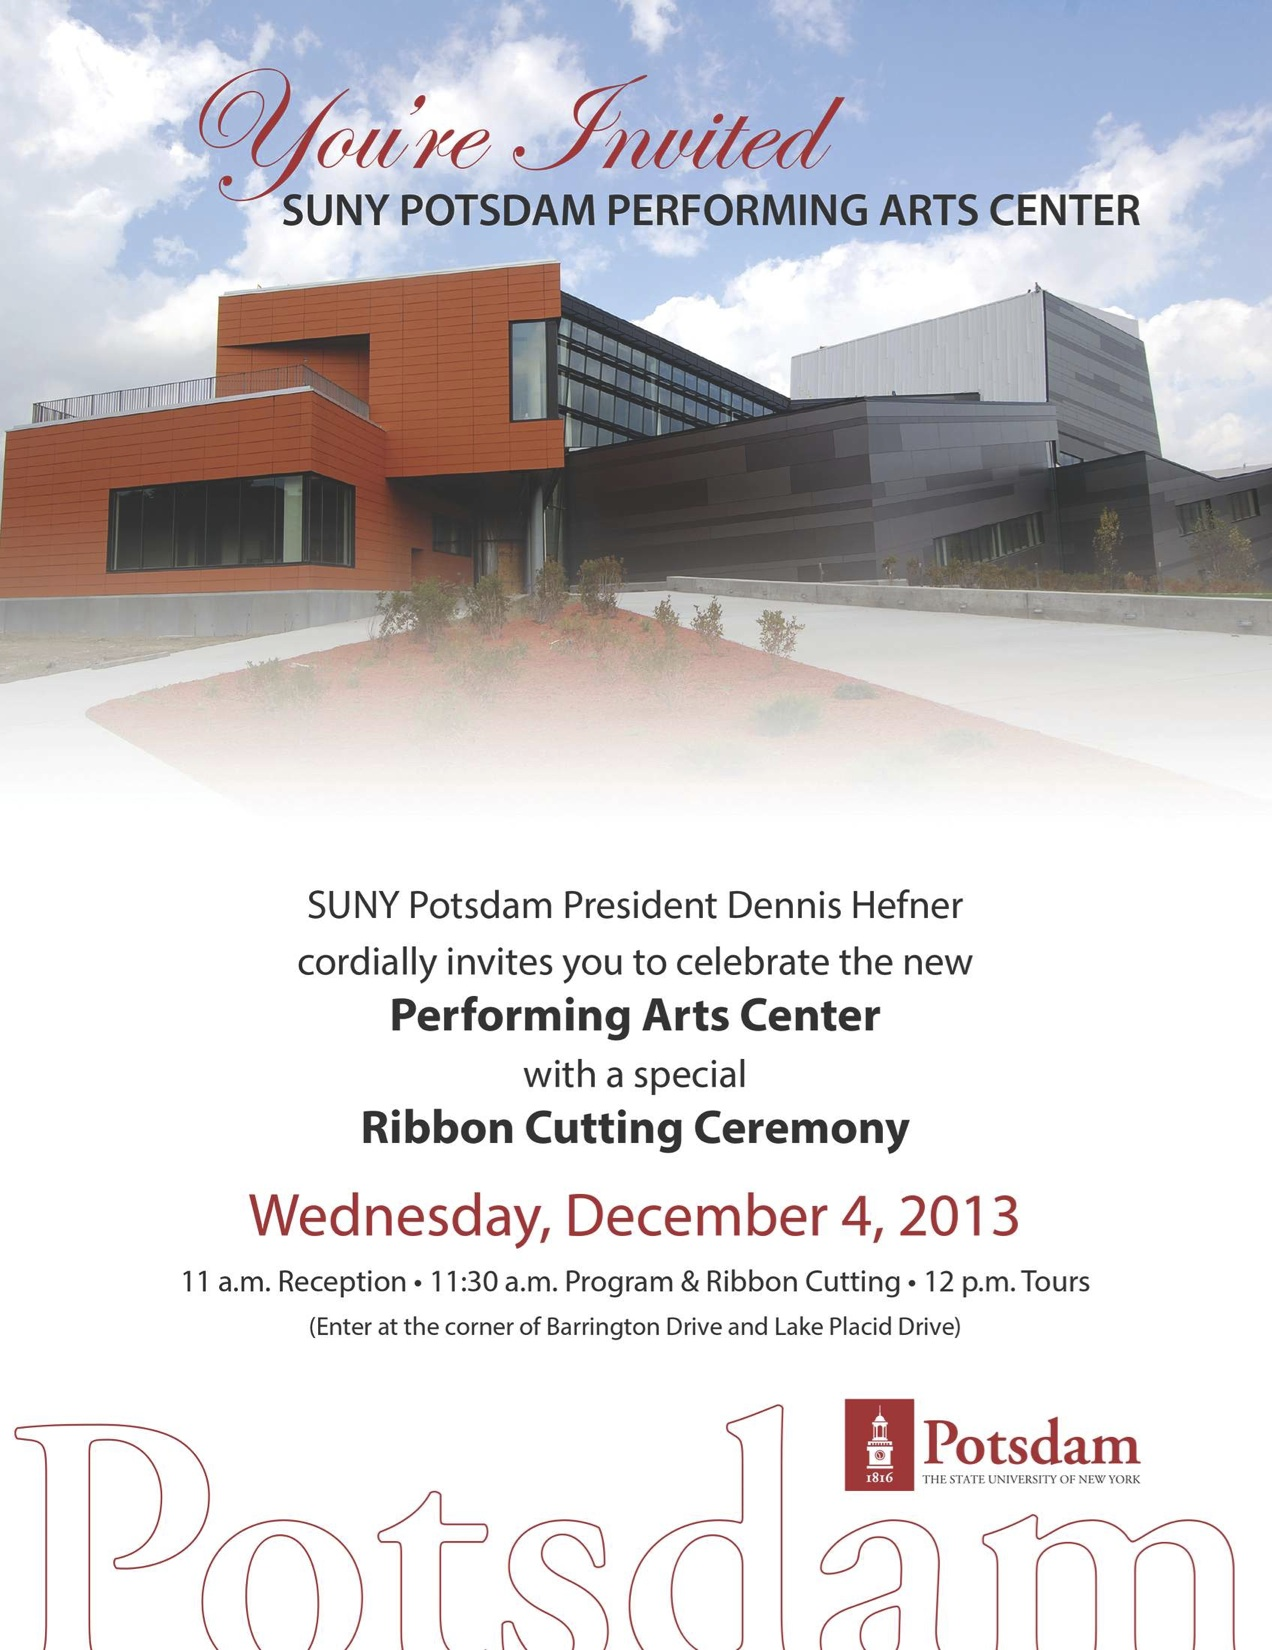 Suny Potsdam Celebrates Ribbon Cutting Ceremony For New Performing